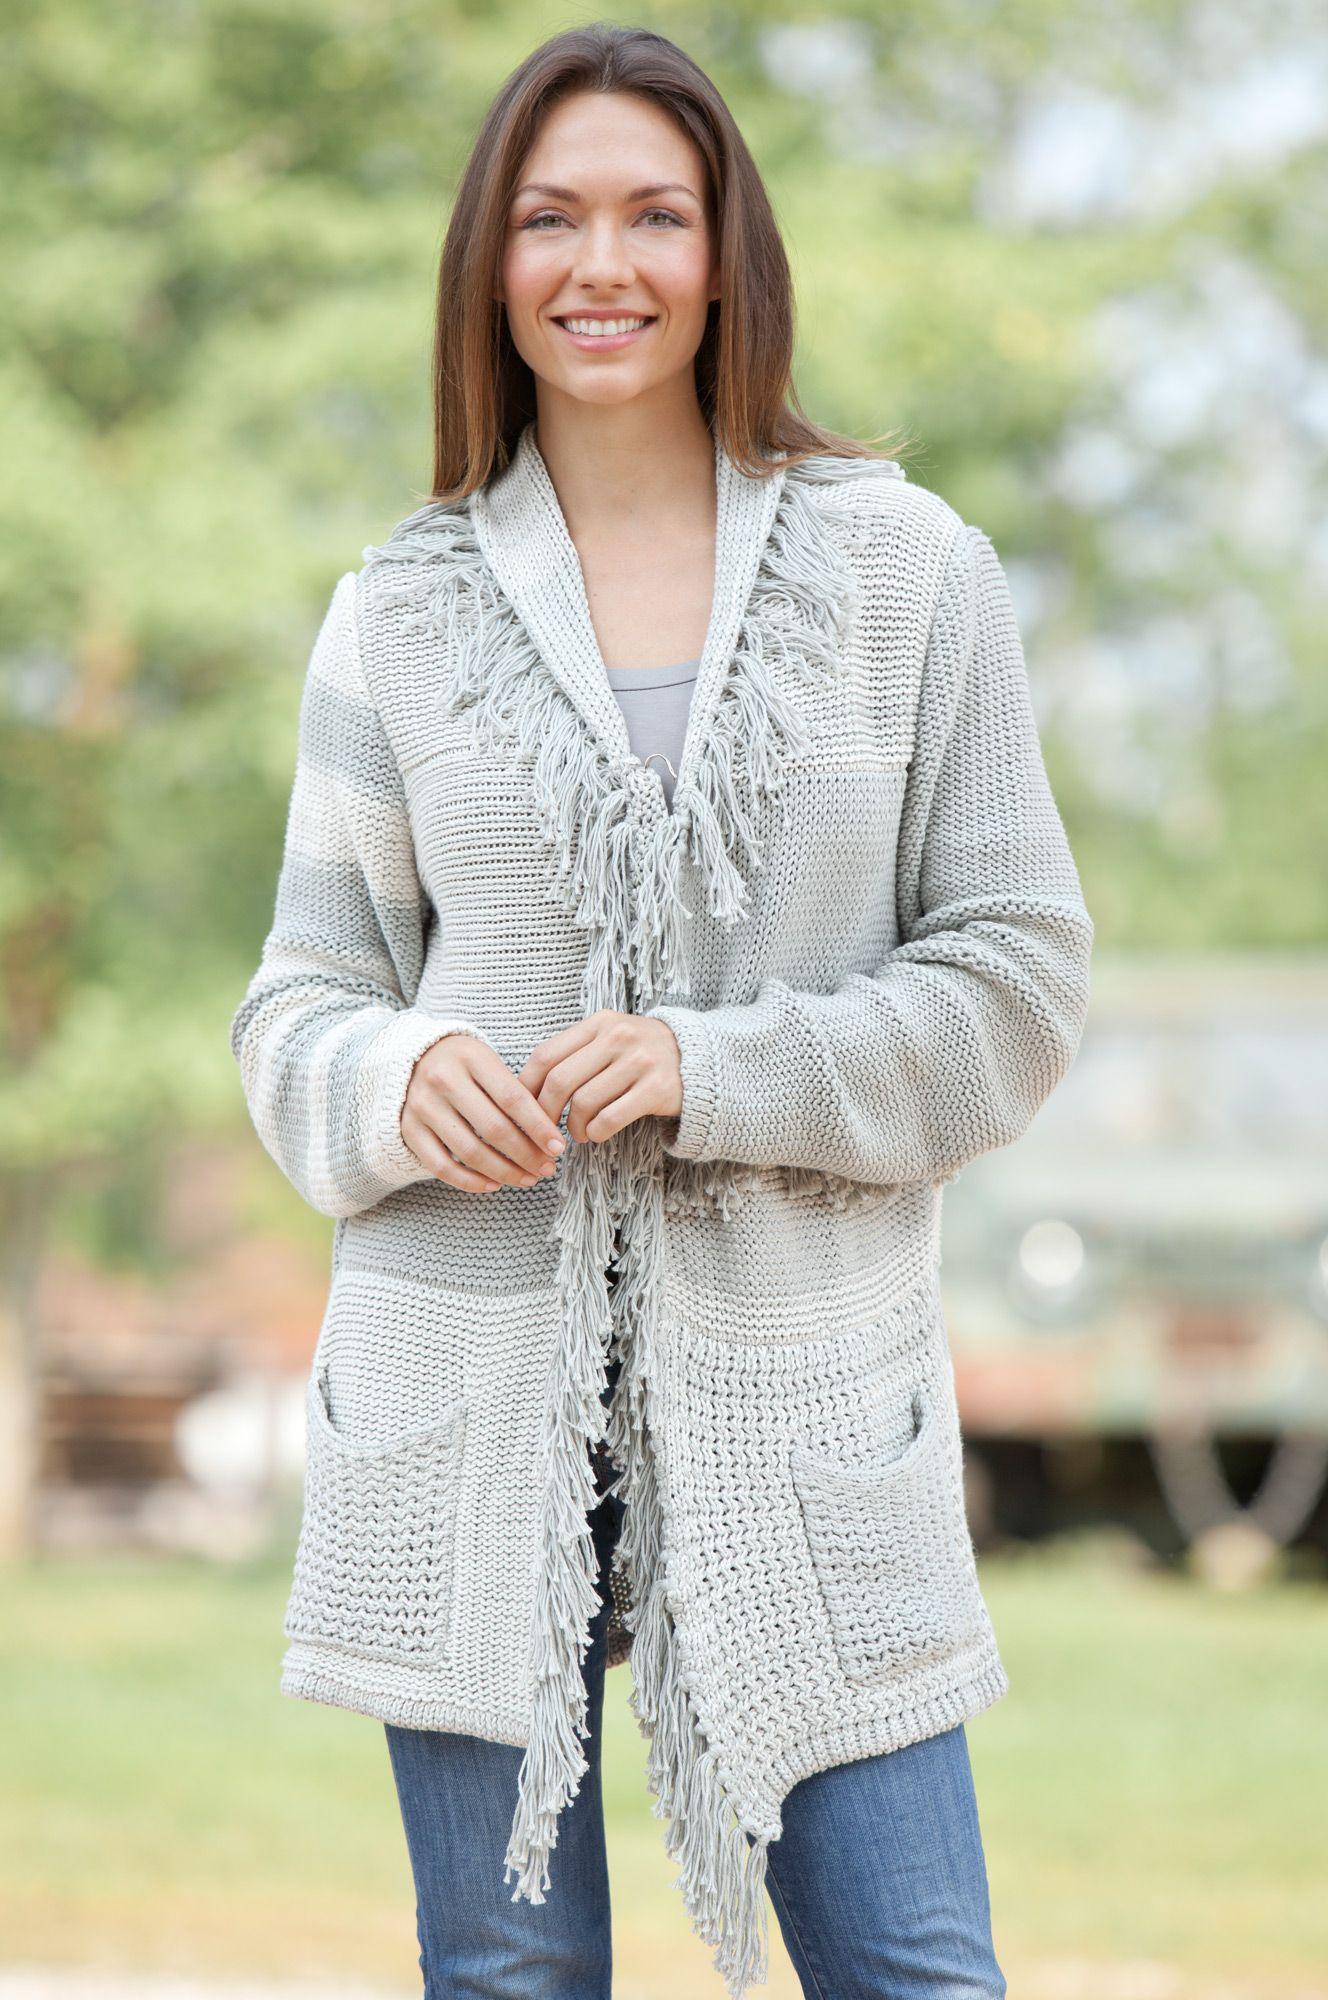 Women's Fanciful Fringe Handmade Cotton Cardigan Sweater Style ...